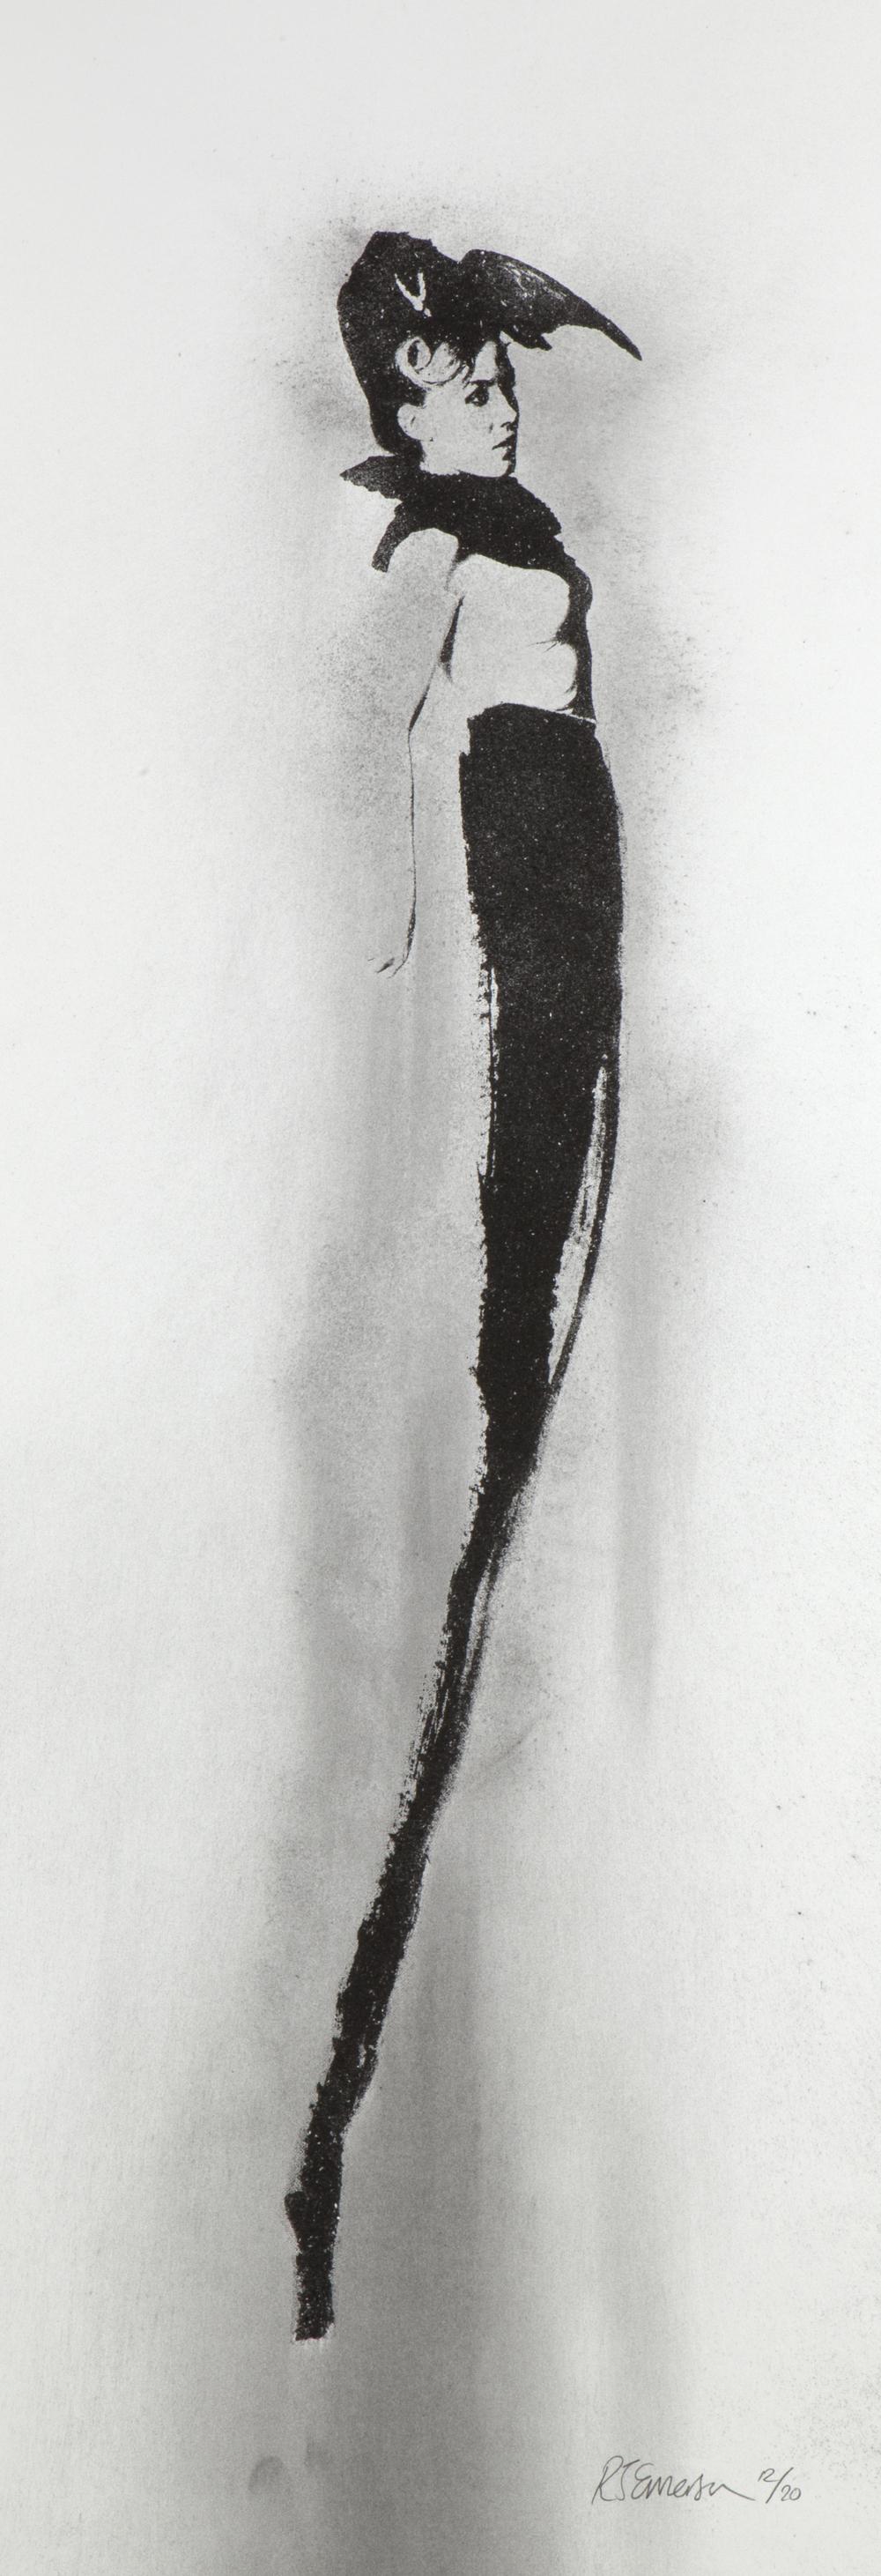 Shrine # 3 Rosie – Ed. 20  Screenprint with charcoal powder on paper Artwork: 90 x 35 cm 2013